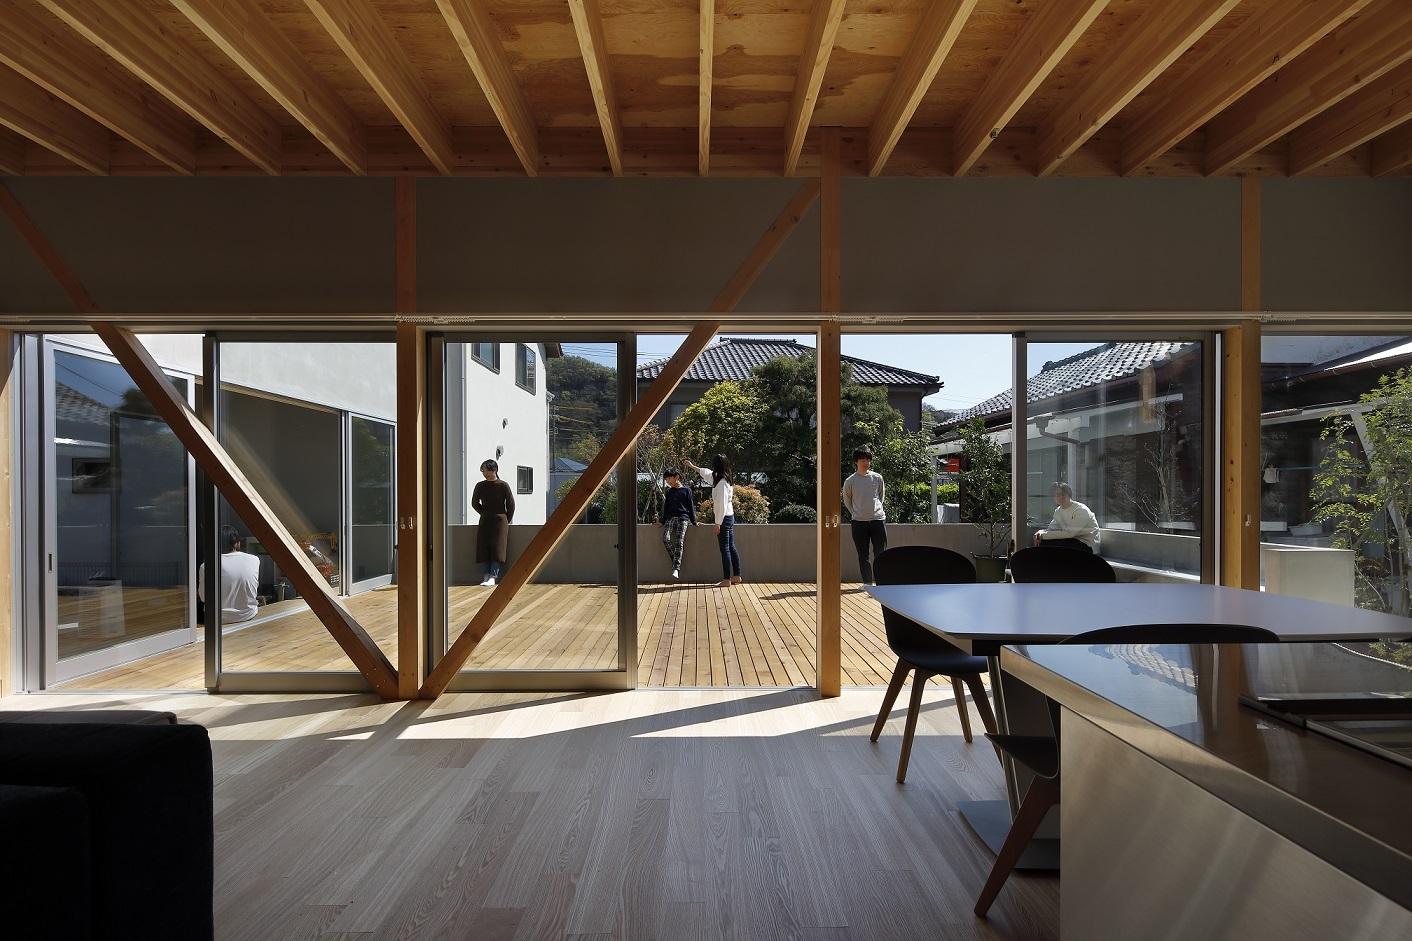 Gallery Of Terrace In The Town Yamazaki Kentaro Design Workshop 2,Autodesk Product Design Suite Logo